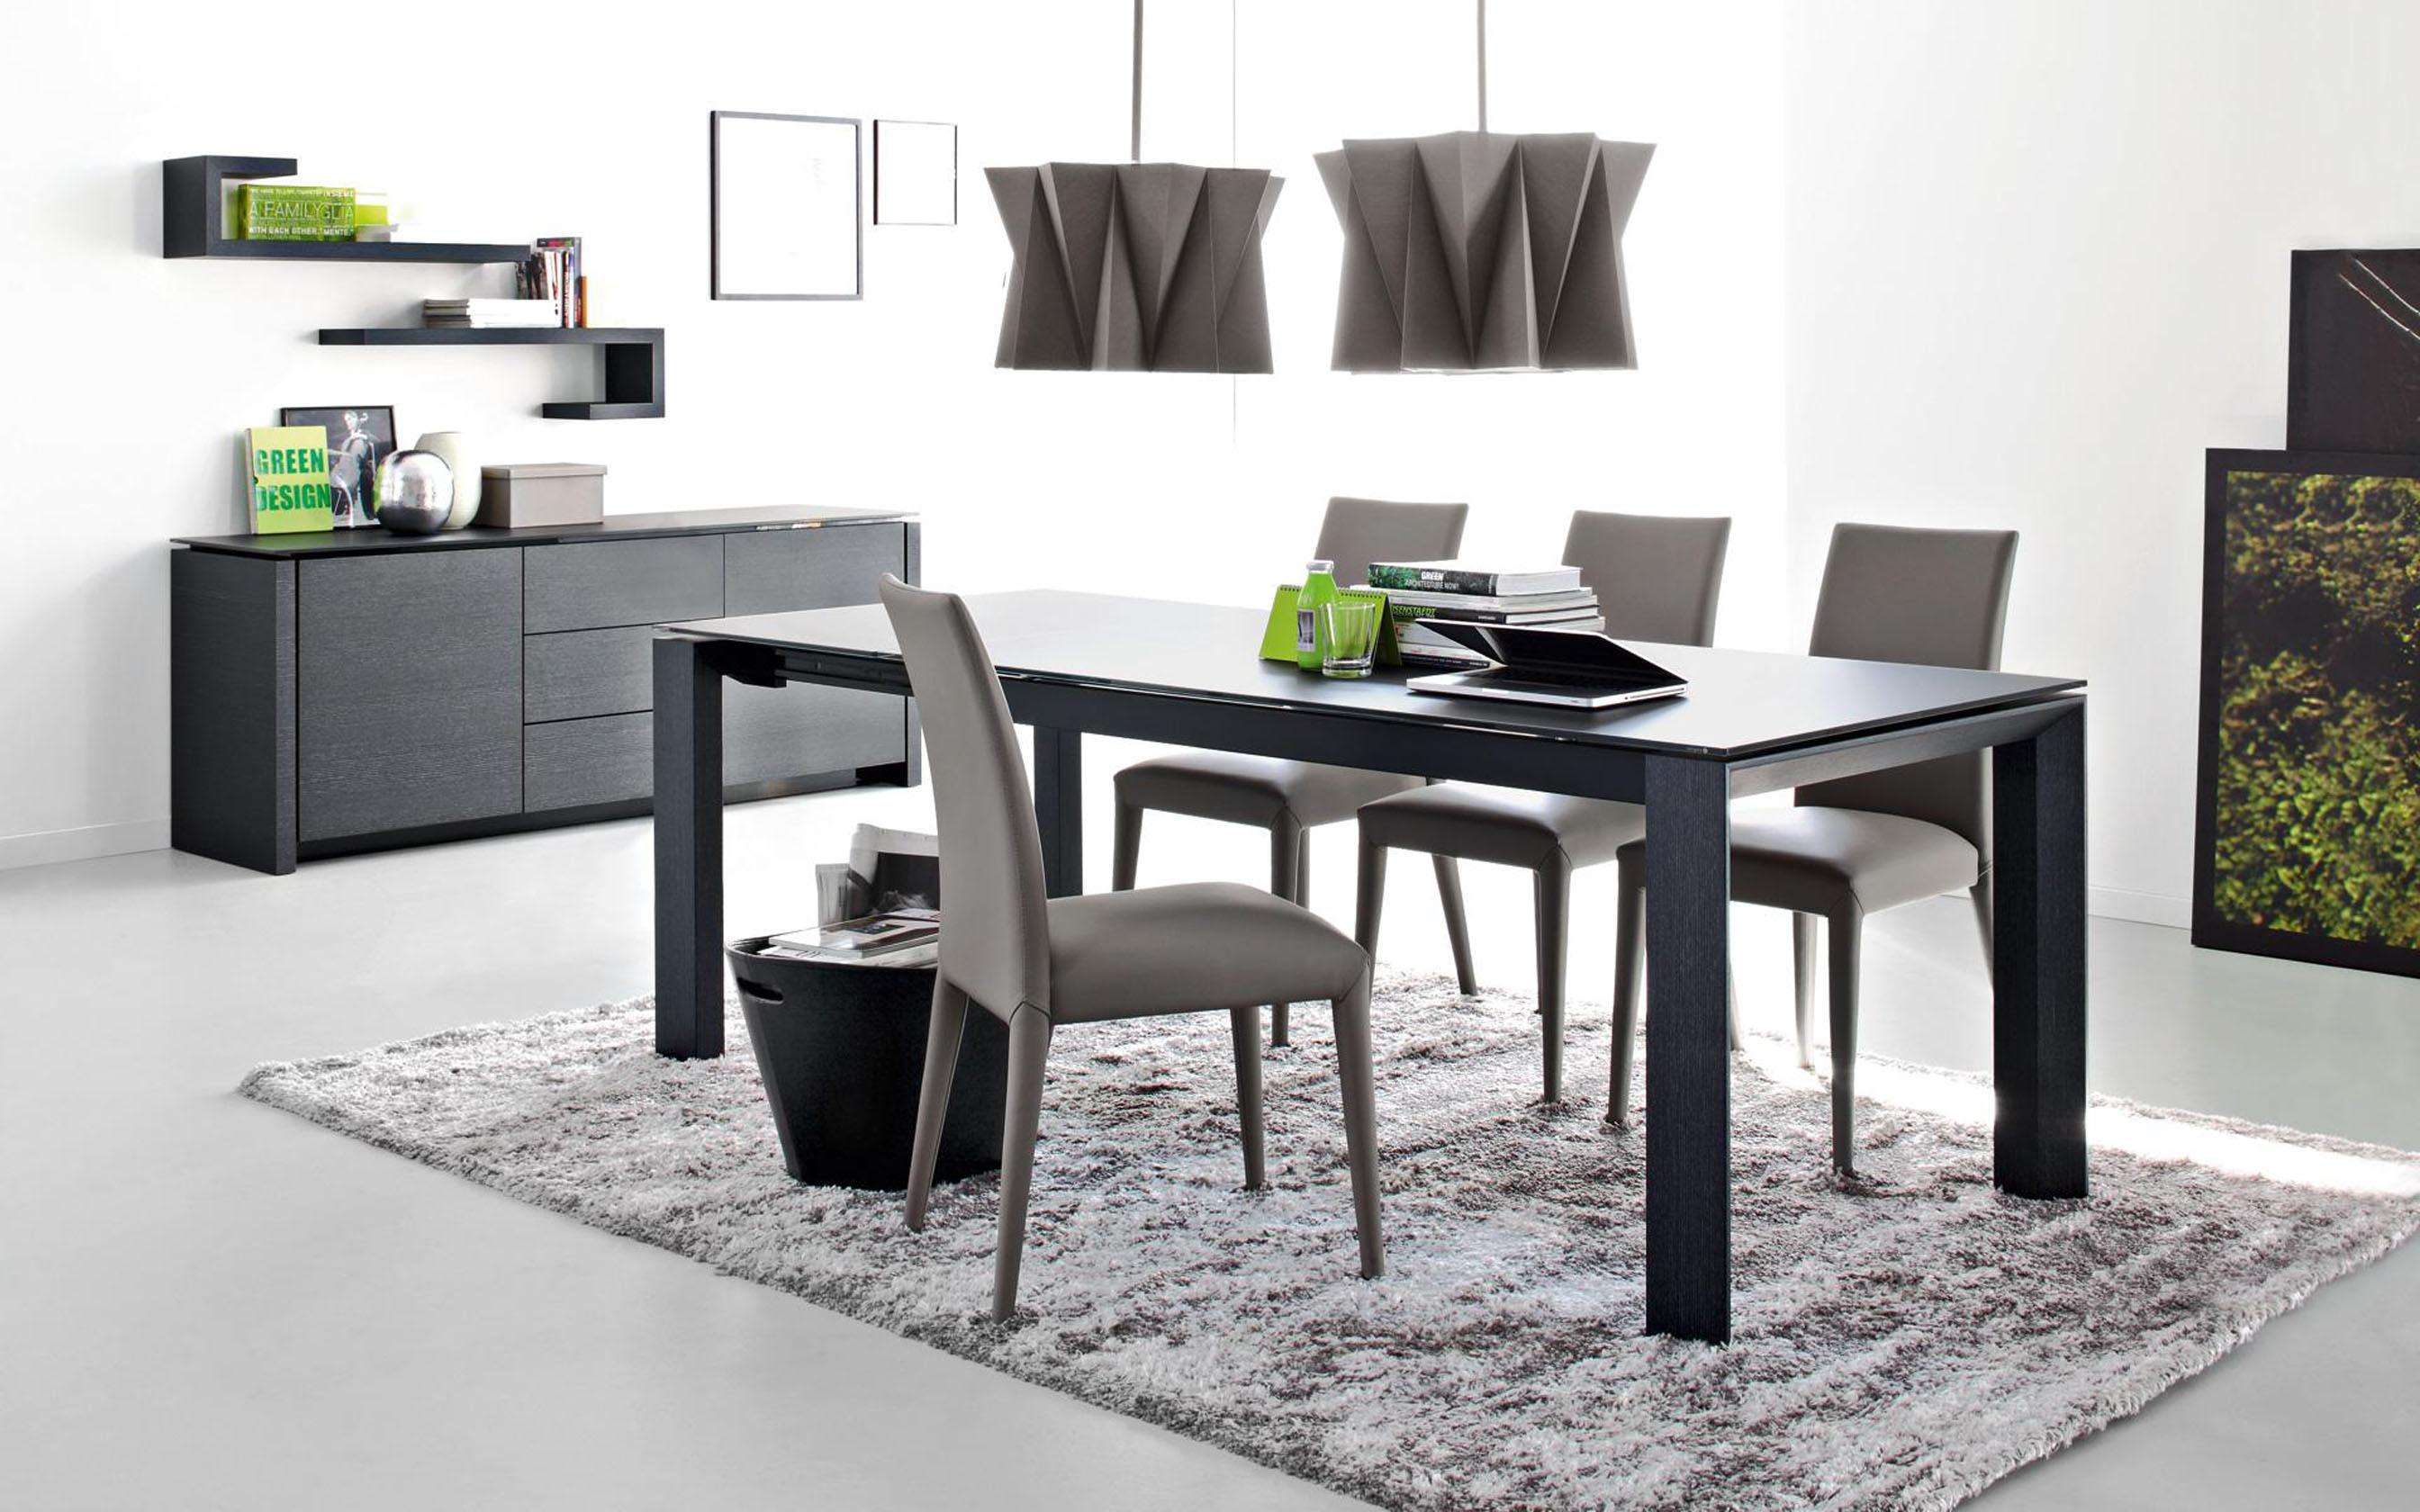 Sedie cucina offerte roma: ikea cuscini sedie cucina best per sedia